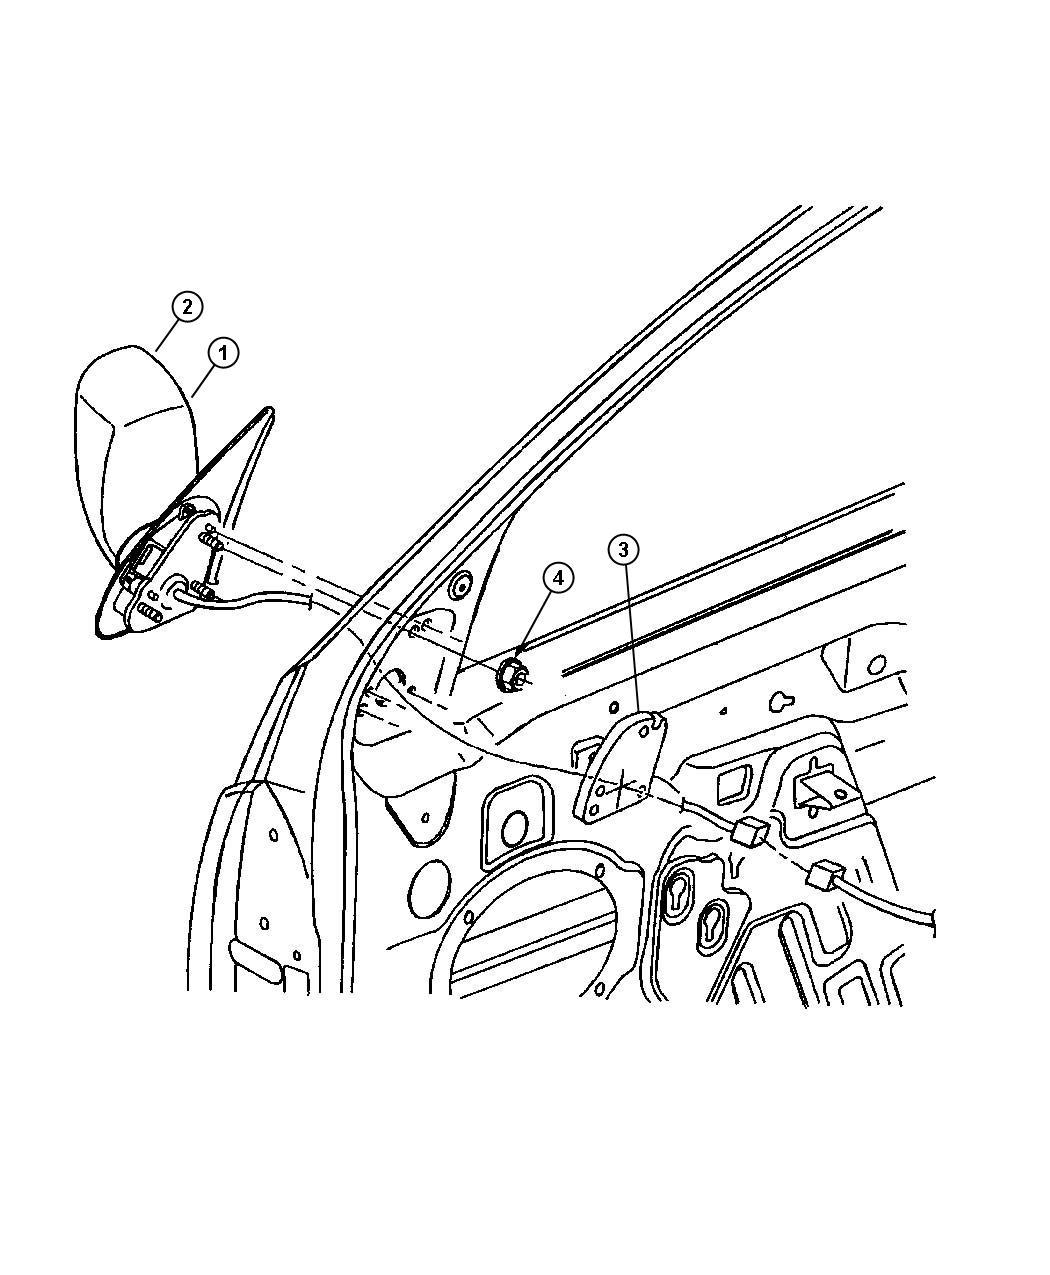 jeep grand cherokee glass  mirror replacement  left  gtn  powergtj  folddiesel